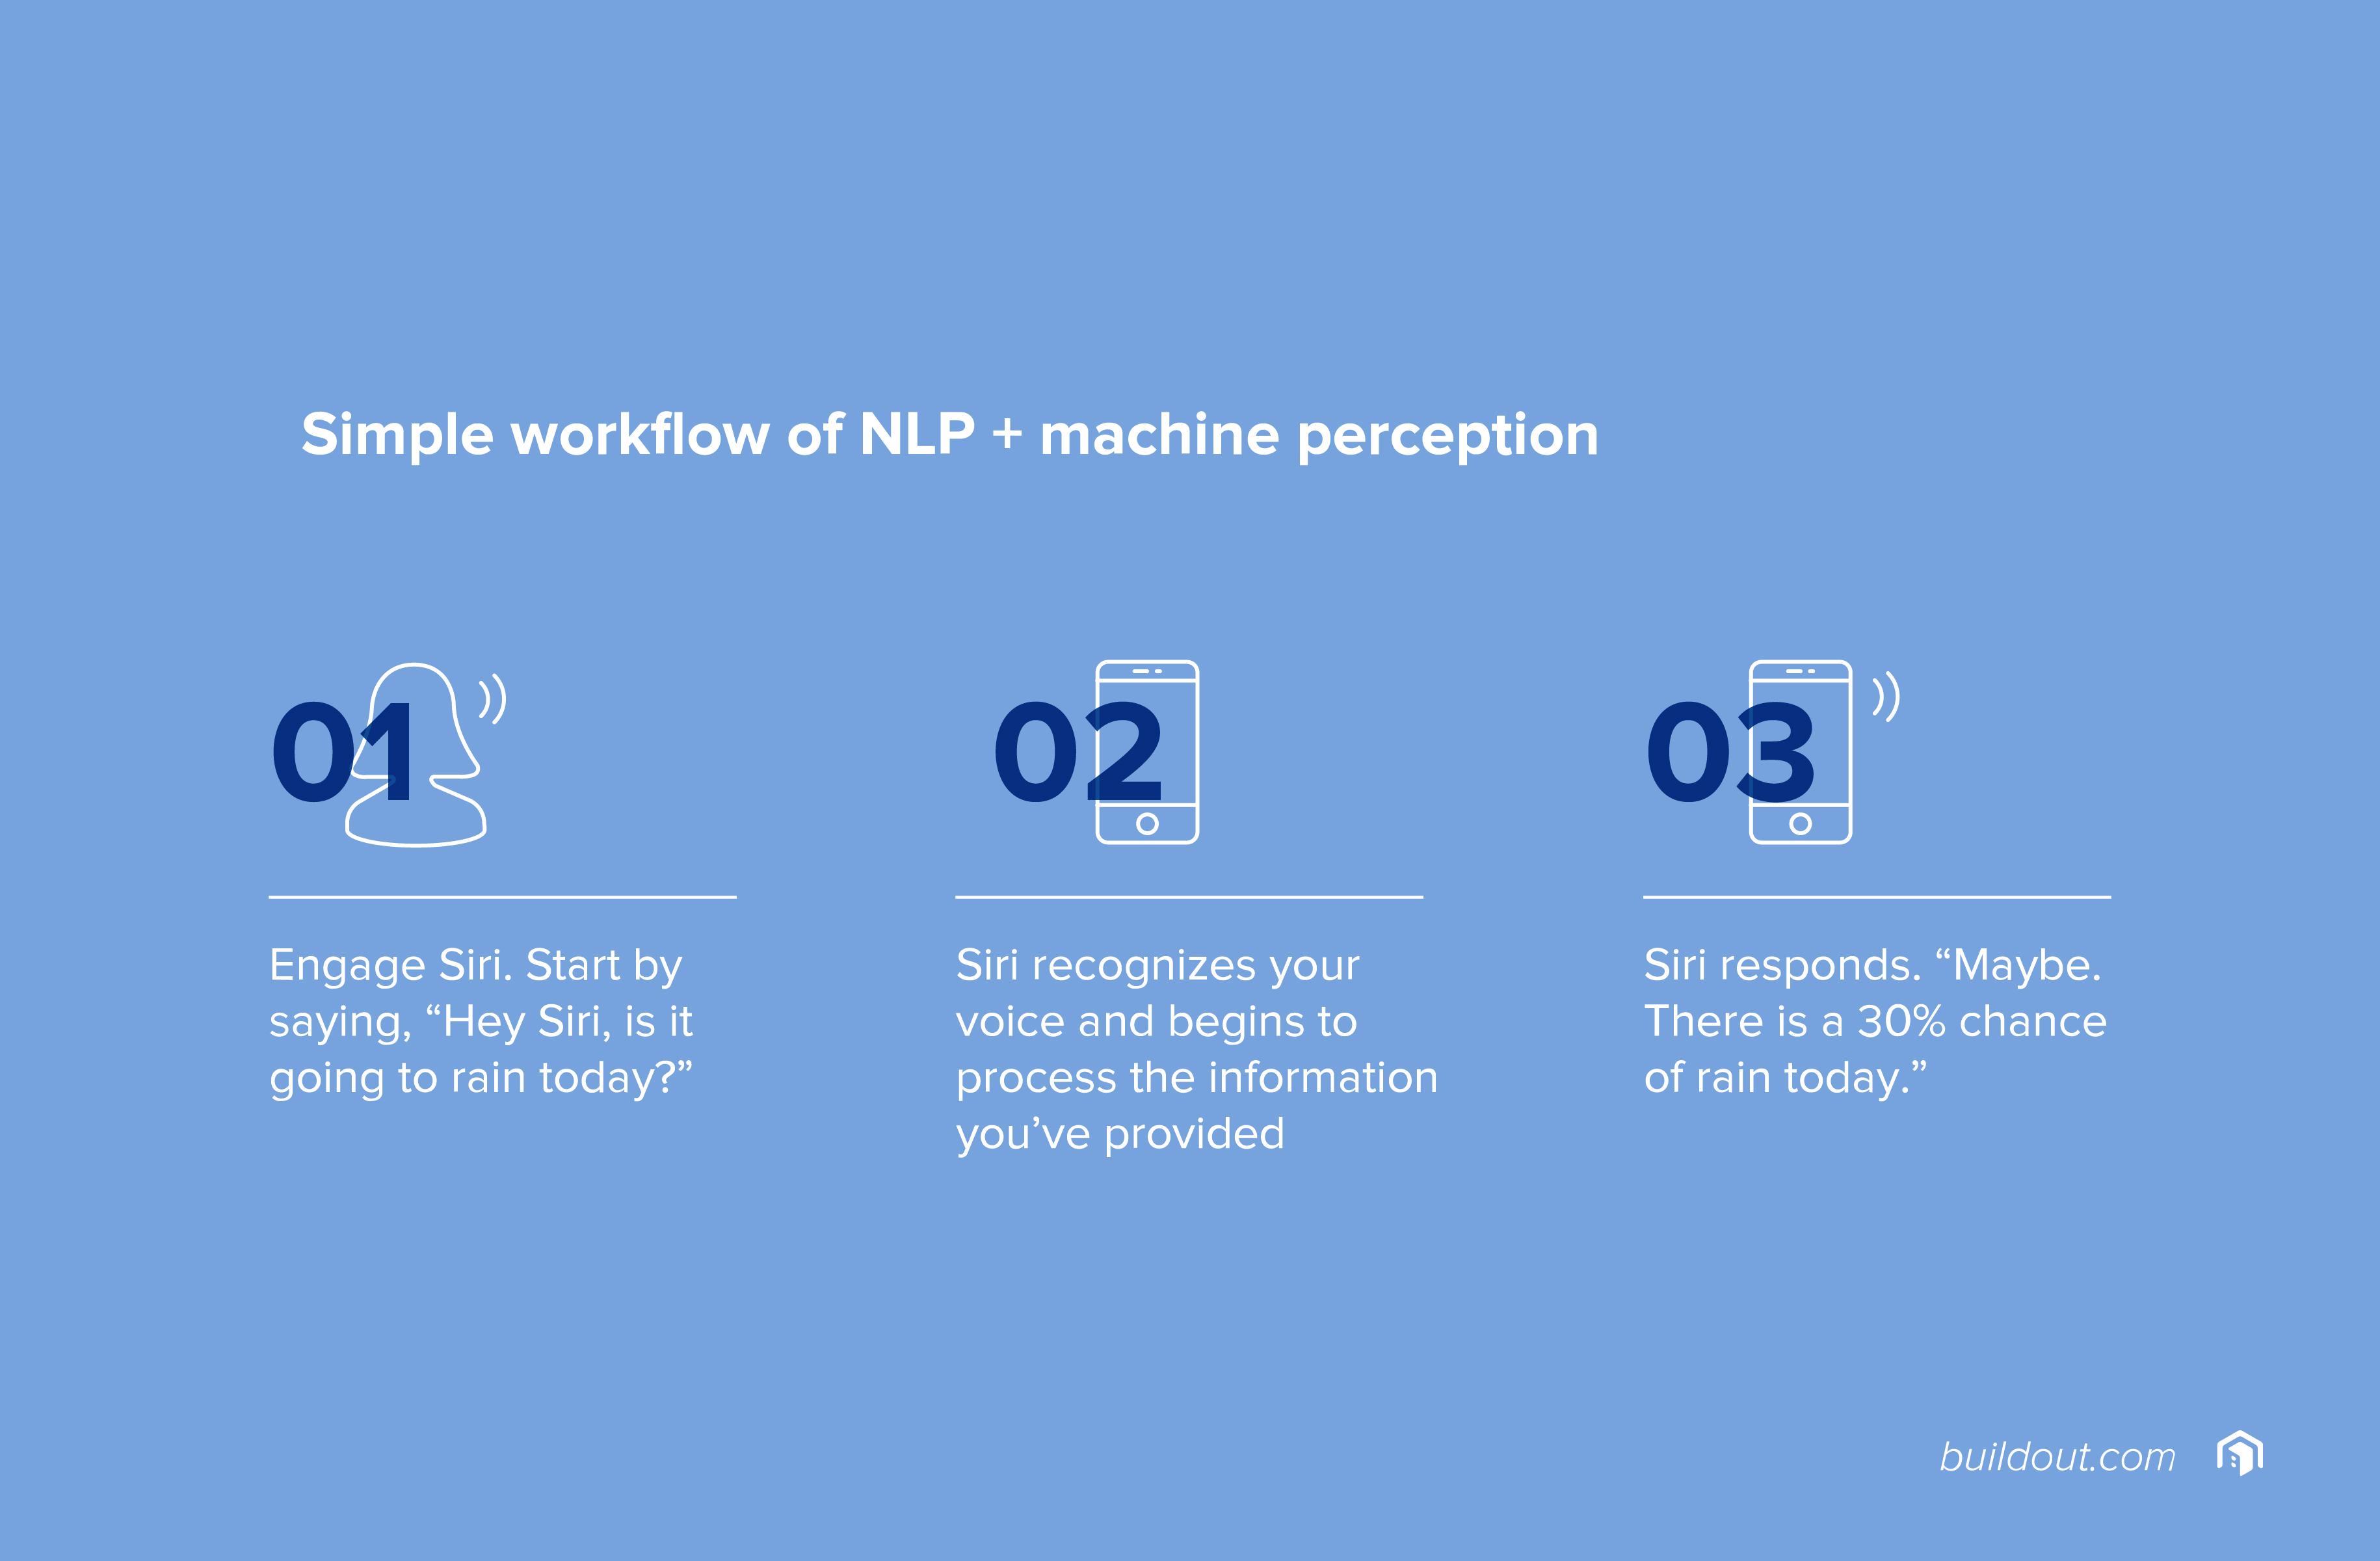 Simple workflow of NLP + machine perception